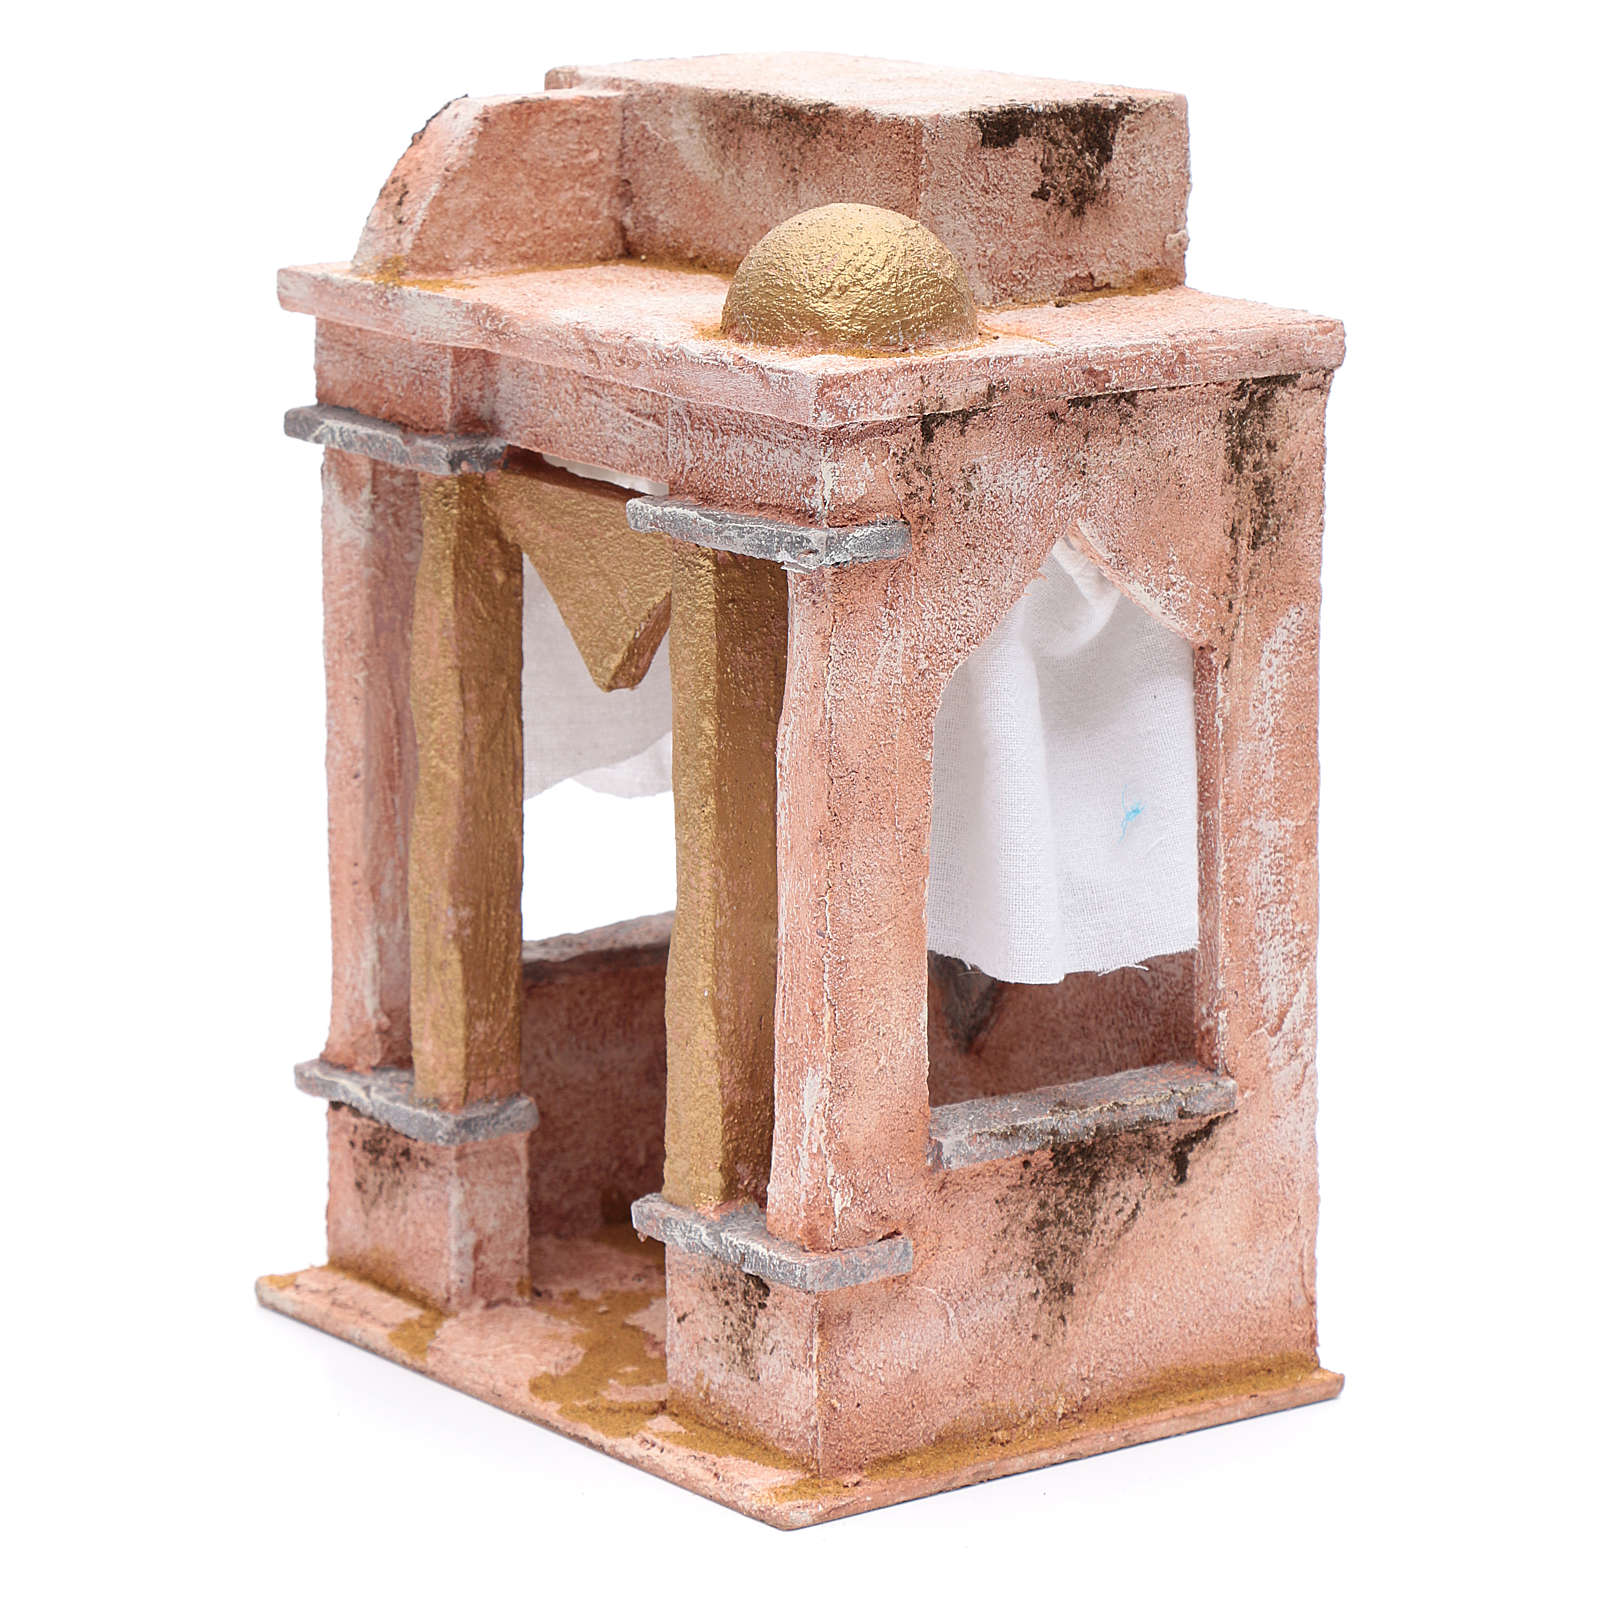 Arabian style temple with columns 25x20x15 cm 4